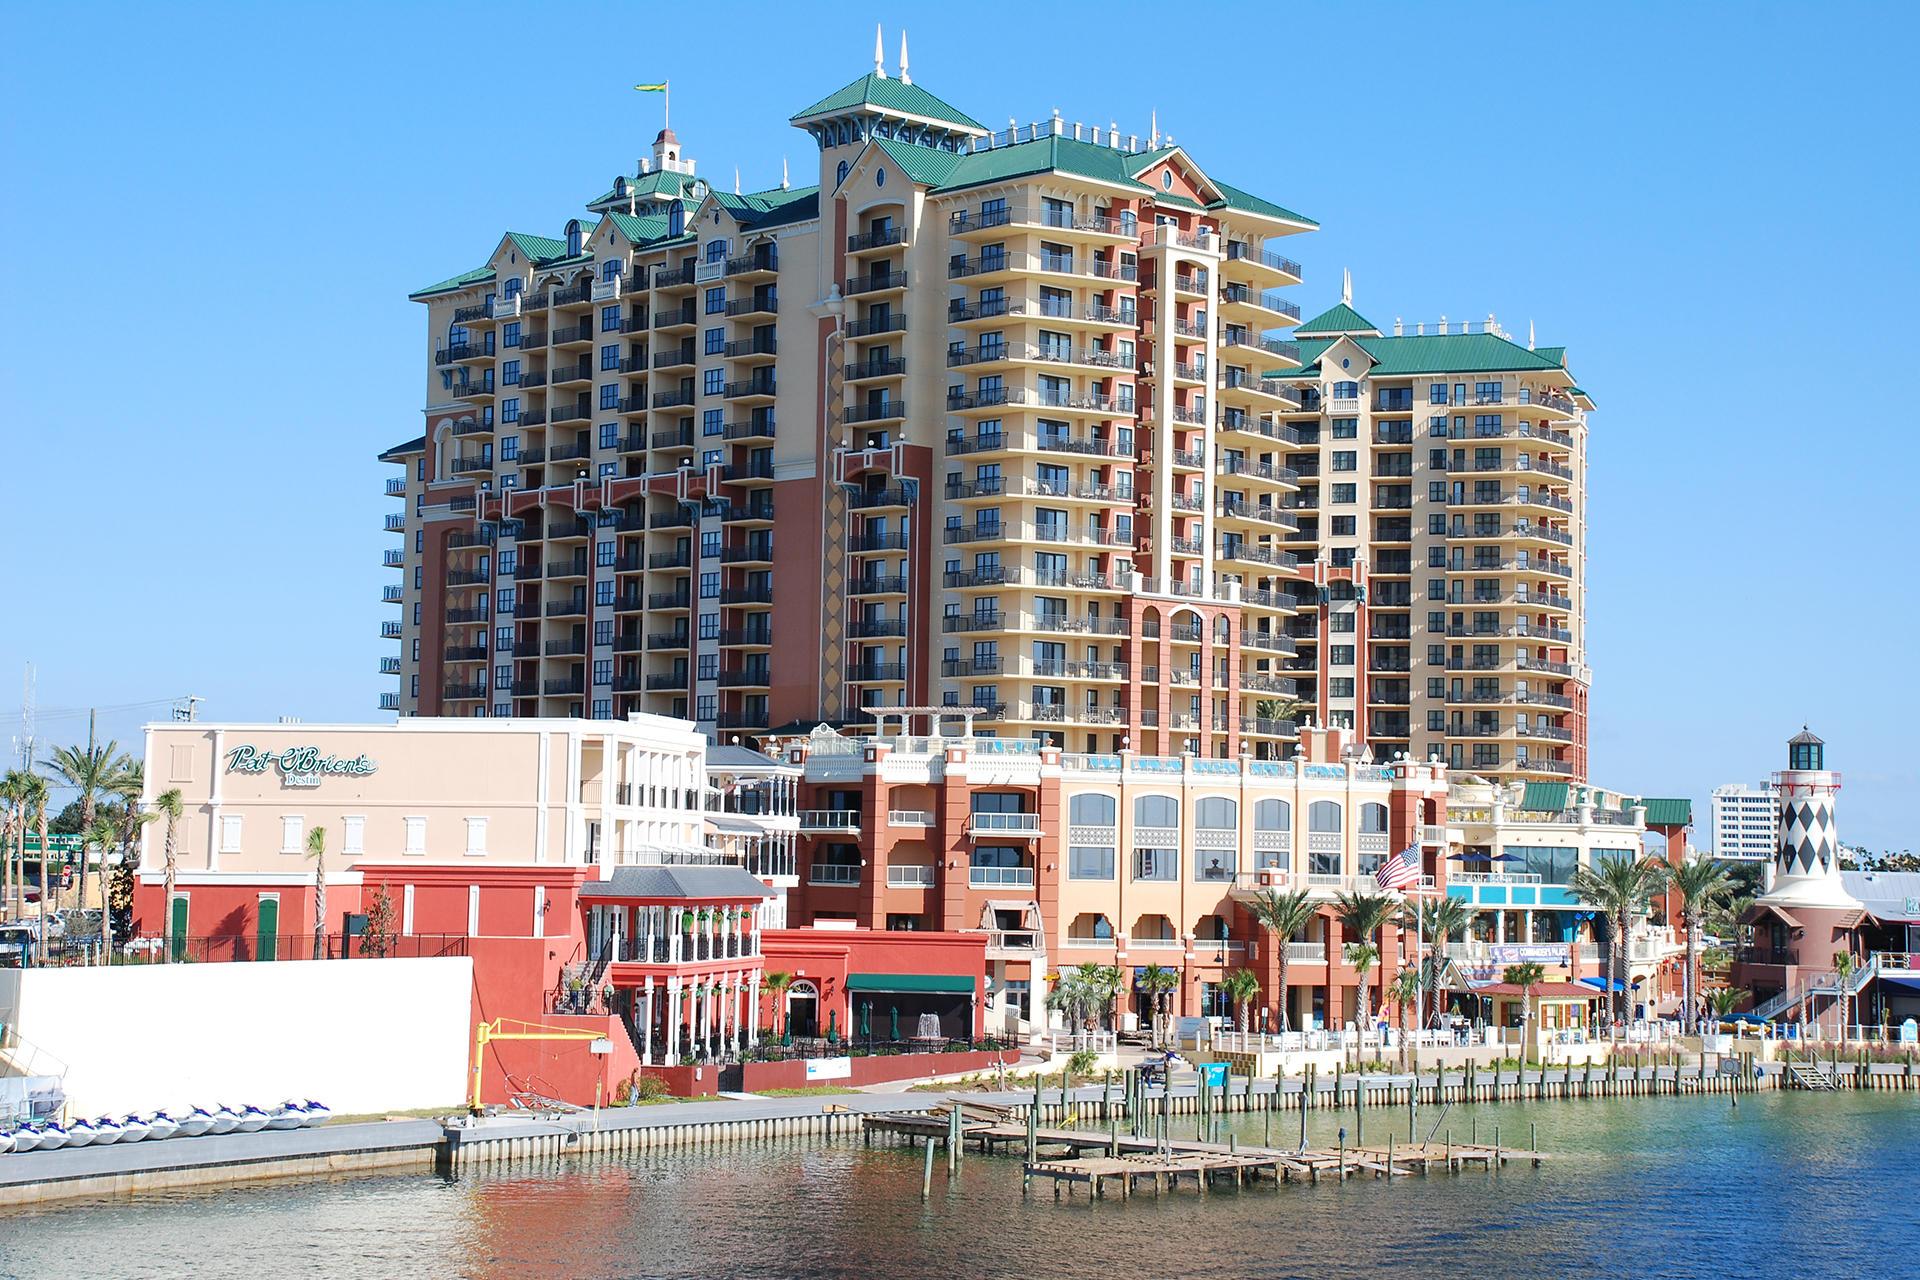 Destin Real Estate Listing, featured MLS property E562105